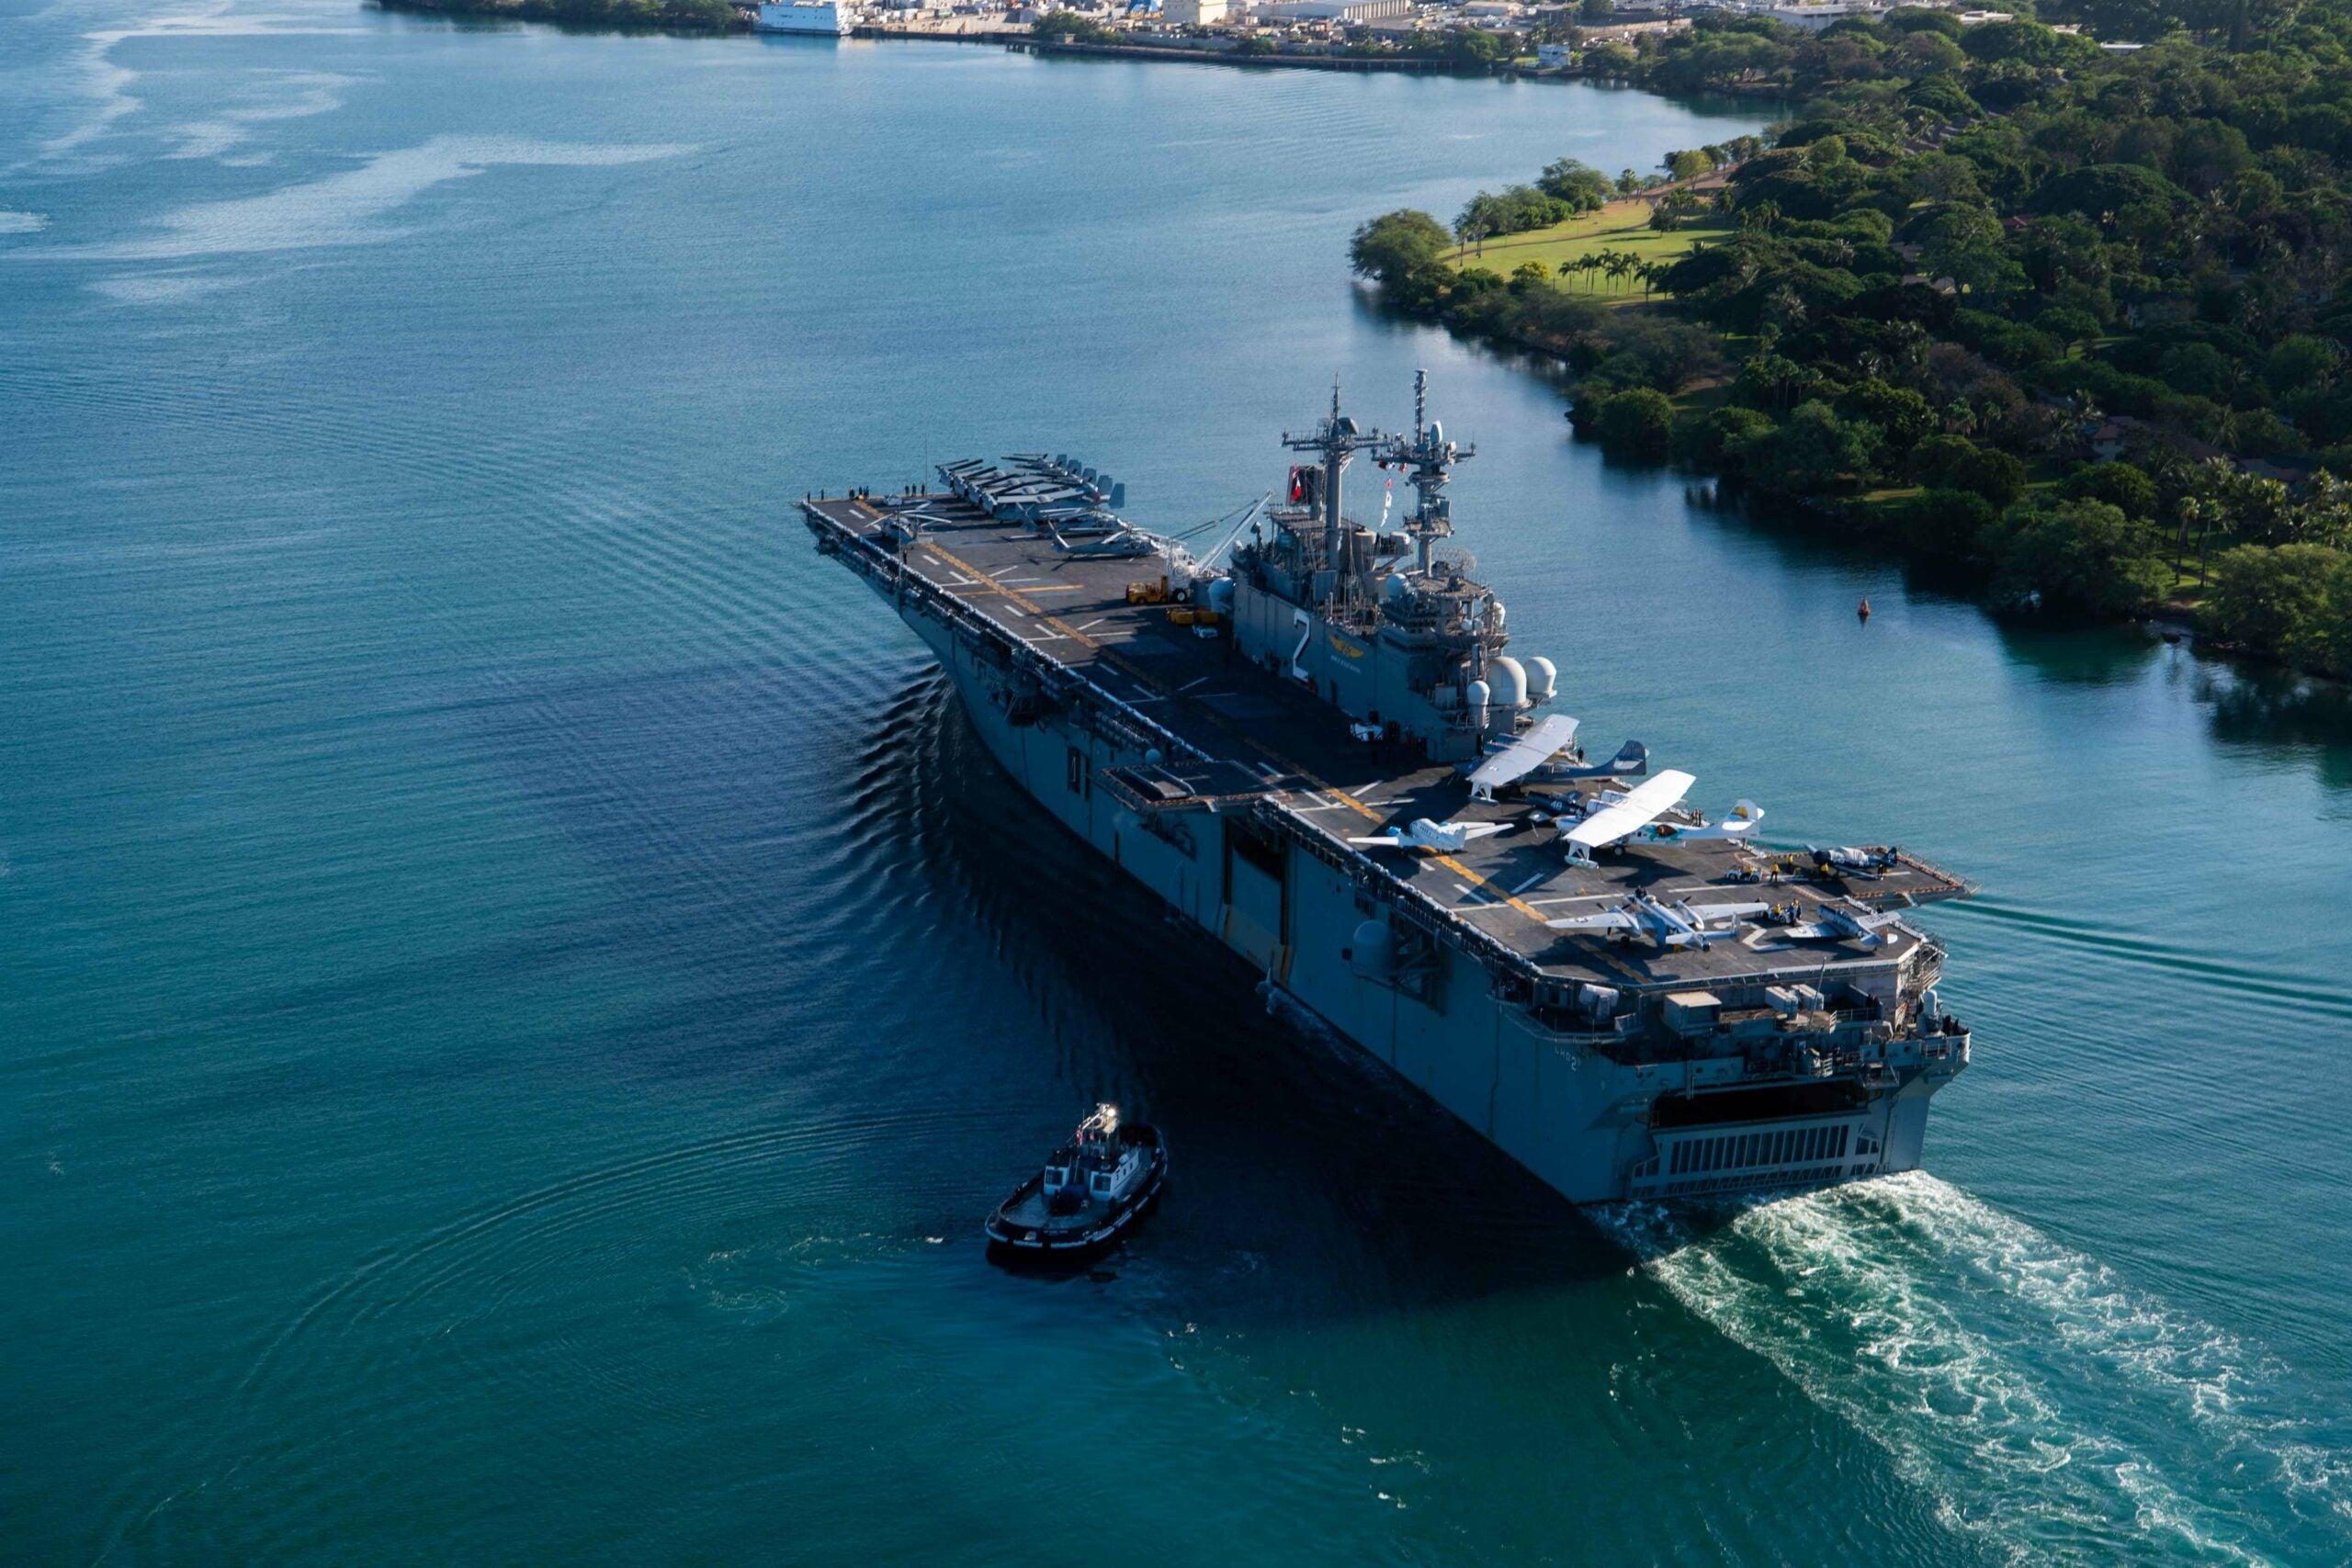 A Navy flattop just rolled up in Hawaii laden with World War II-era warbirds